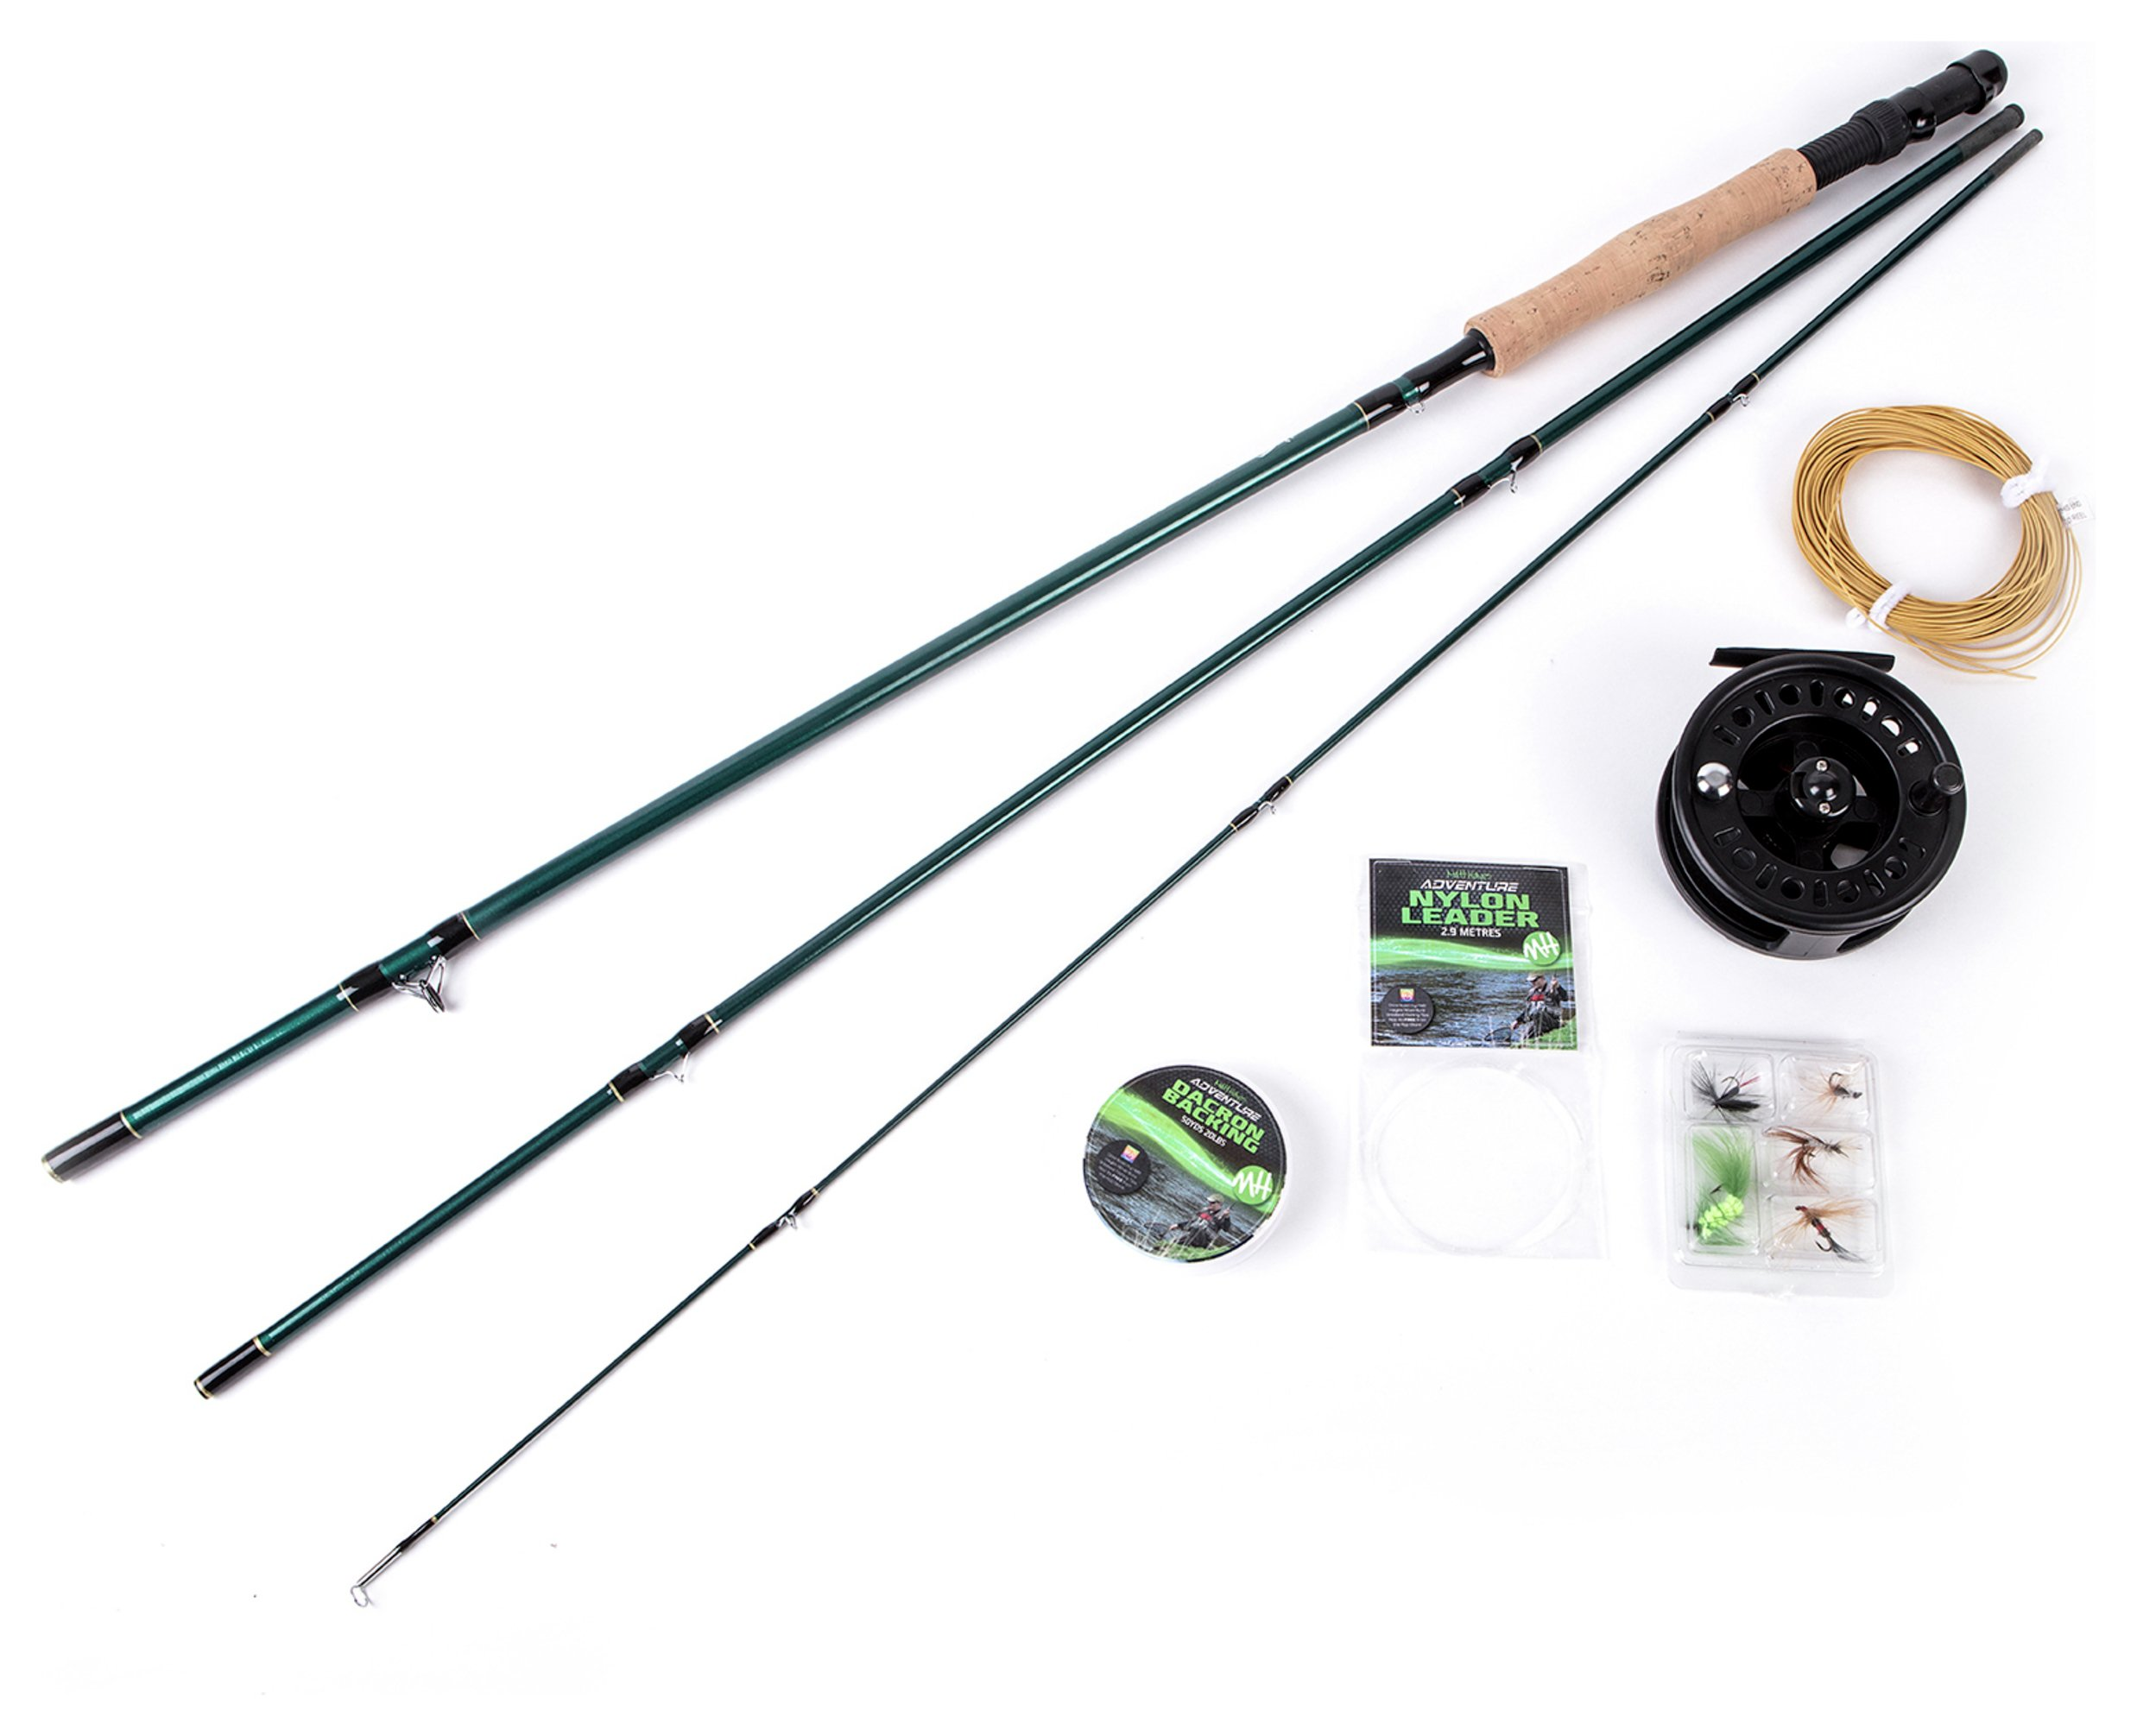 Image of Matt Hayes Fly Fishing Rod, Reel & Accessories